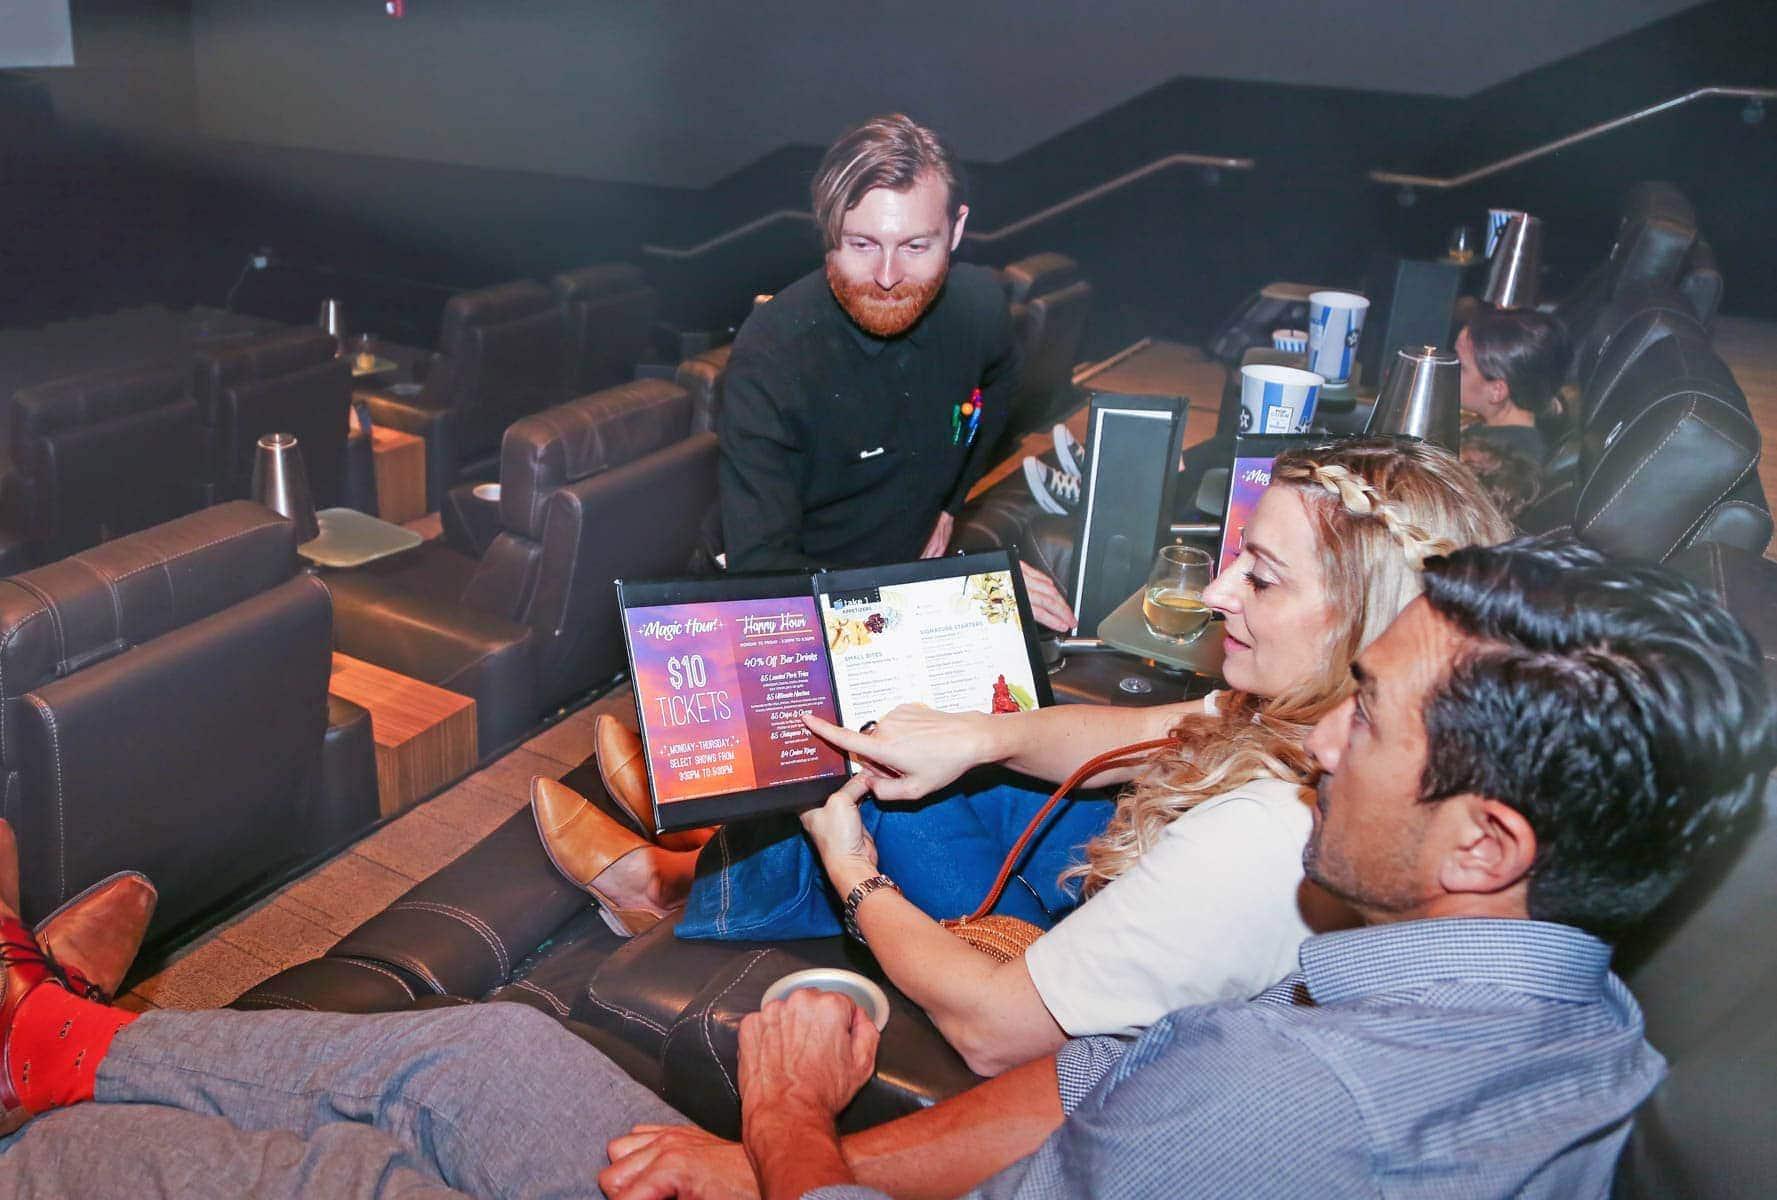 Couple Ordering food #movienight #cinepolis #familybonding #familylove